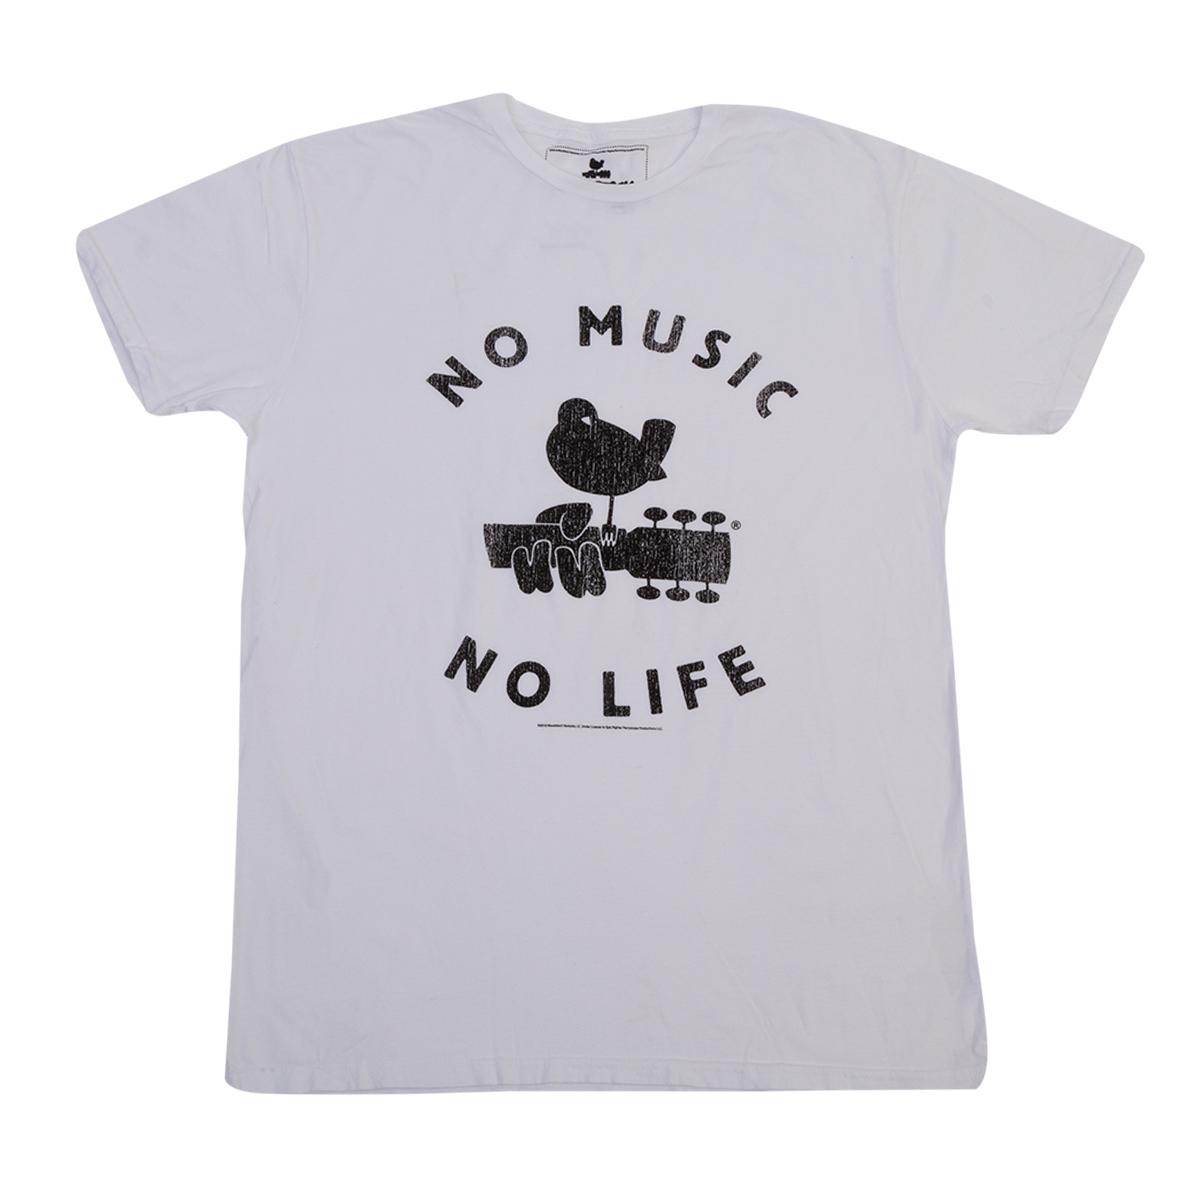 No Music No Life graphic t-shirt